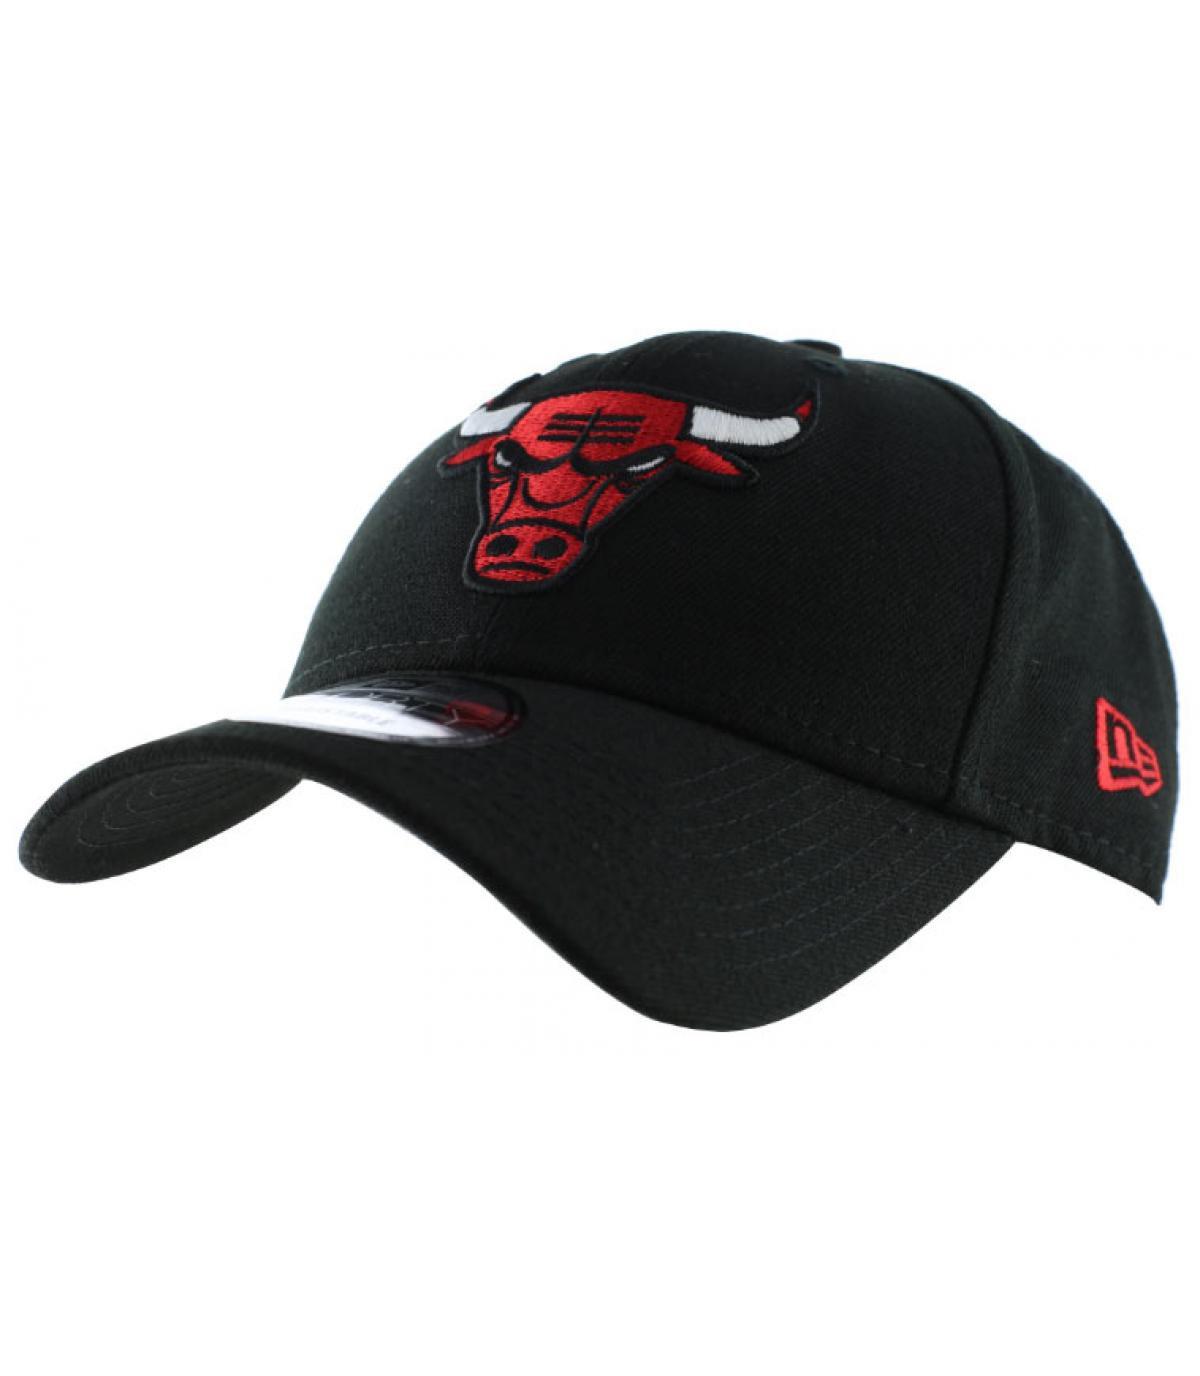 Detalles Cap Chicago Bulls The League Team imagen 2